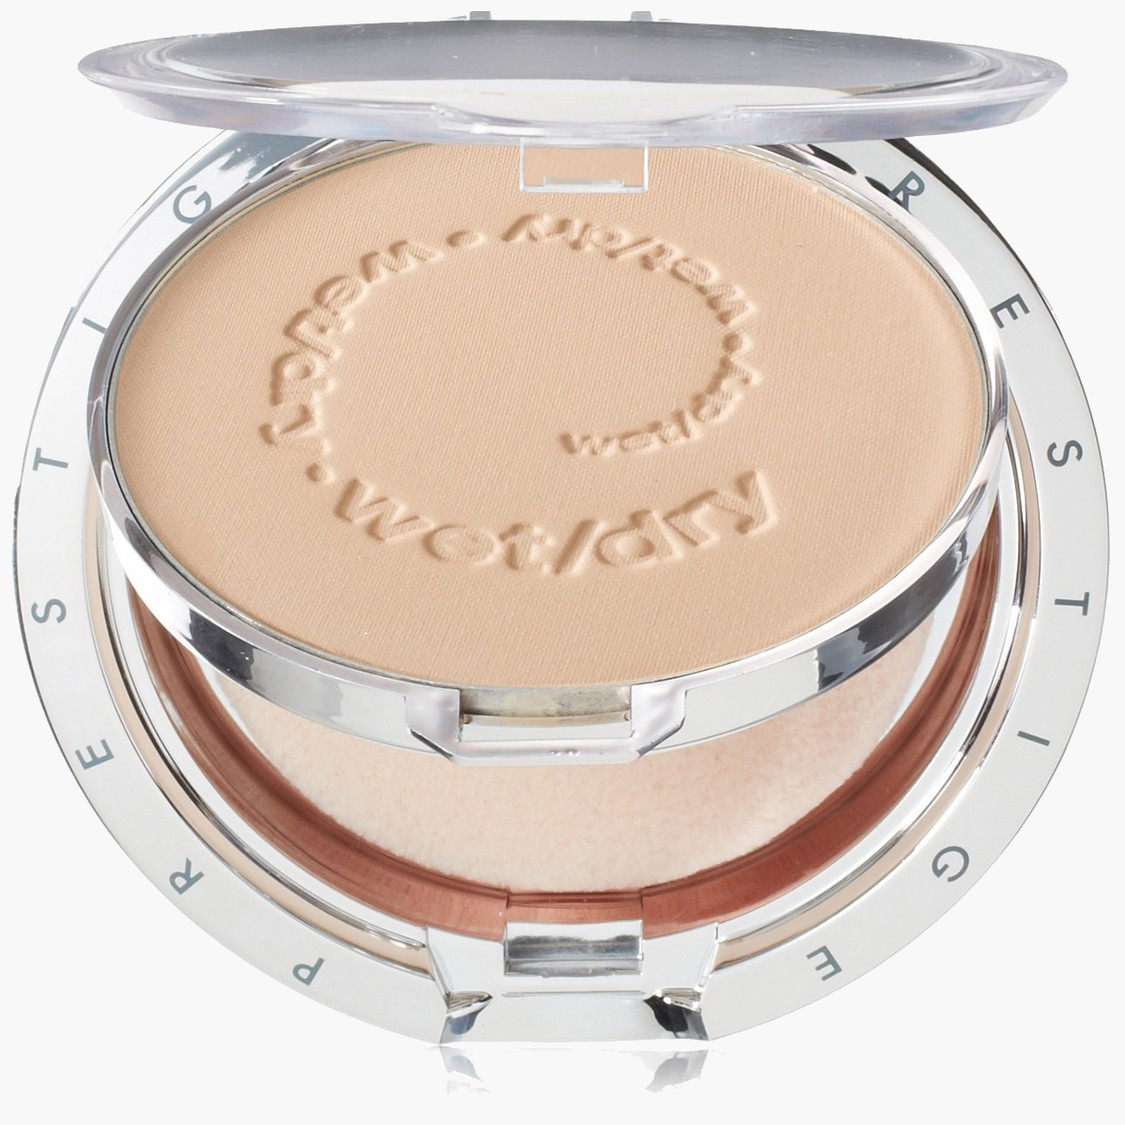 Prestige Cosmetics Wet and Dry Foundation